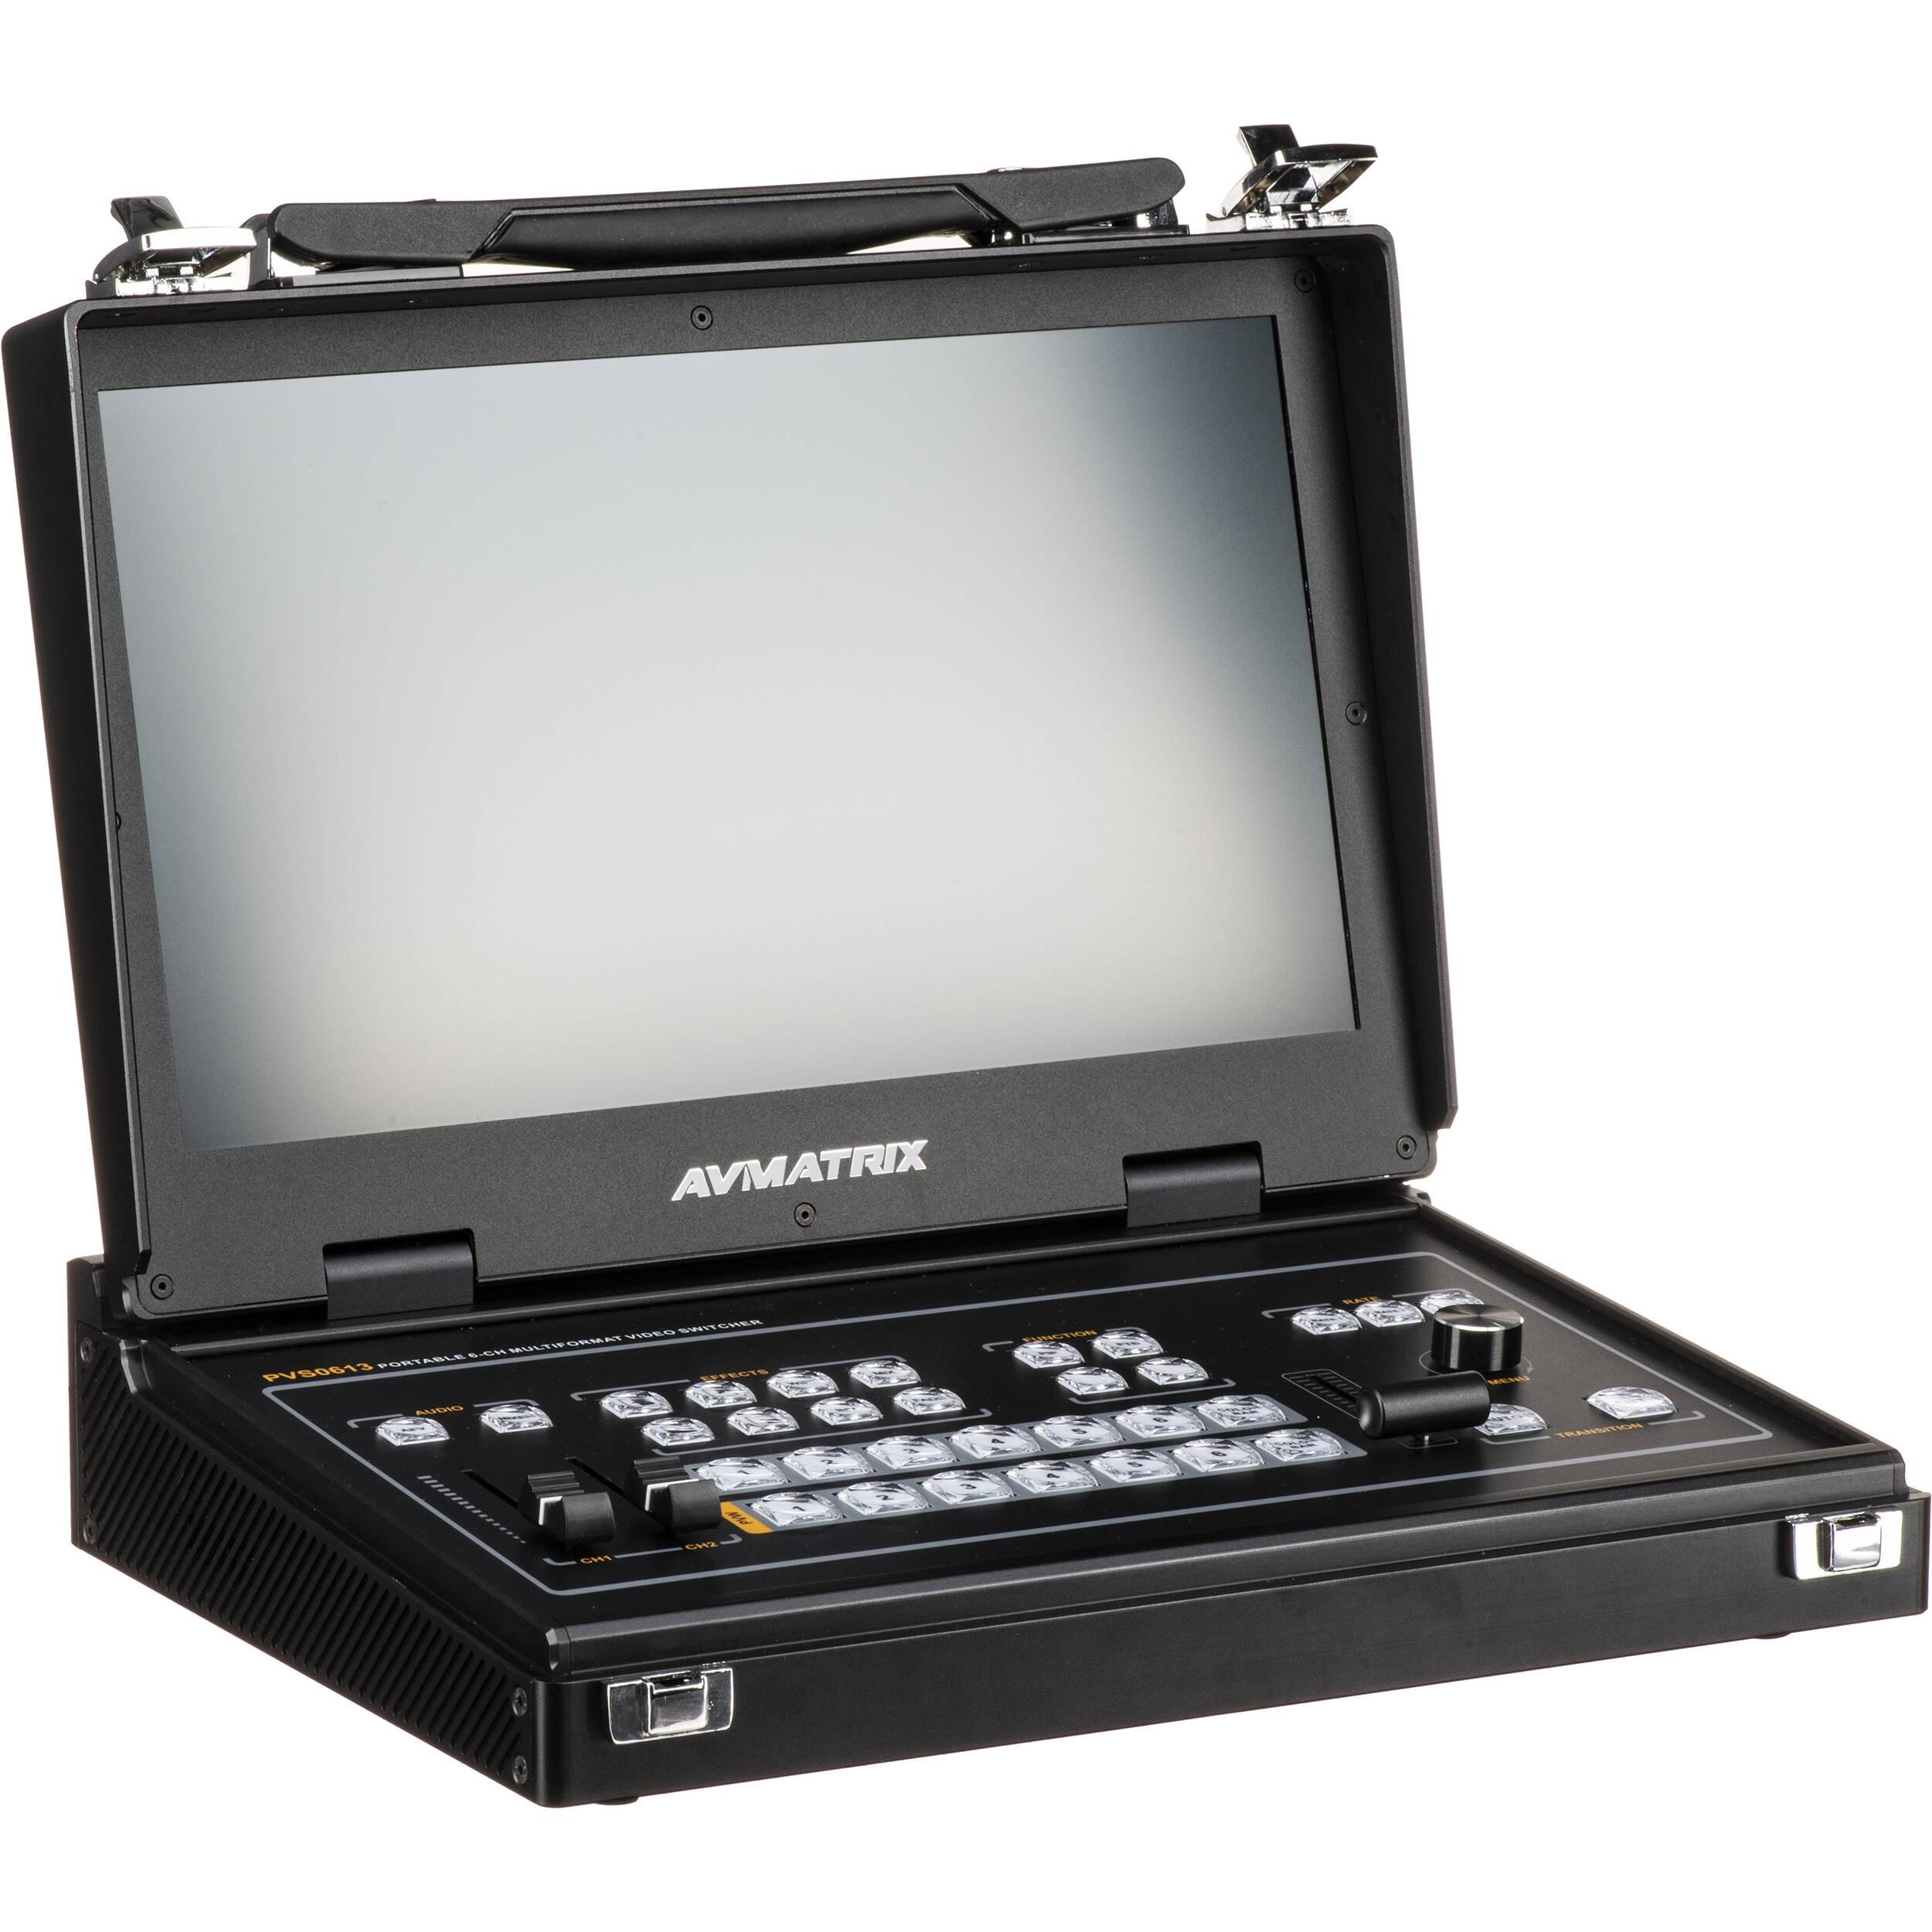 AV Matrix PVS0613 Portable 6-Channel SDI/HDMI Multi-Format Video Switcher